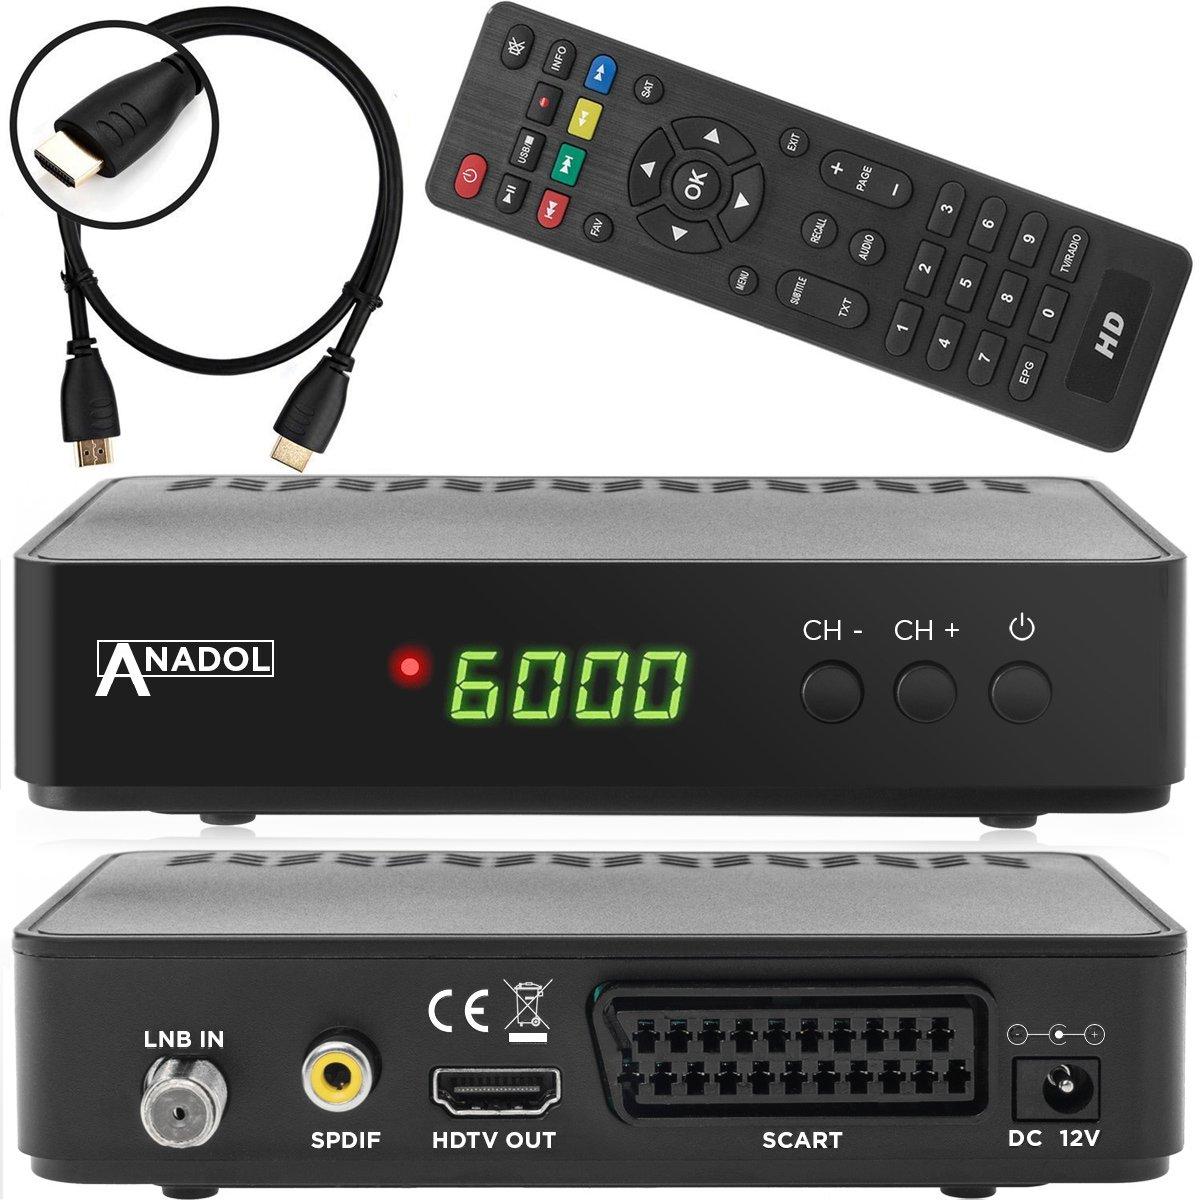 TALLA ohne WLAN. Anadol HD 200+Plus – Receptor satélite digital (HDTV, DVB-S2, HDMI, euroconector, 2 USB 2.0, Full HD 1080p, Youtube), programado, incluye cable HDMI, colornegro